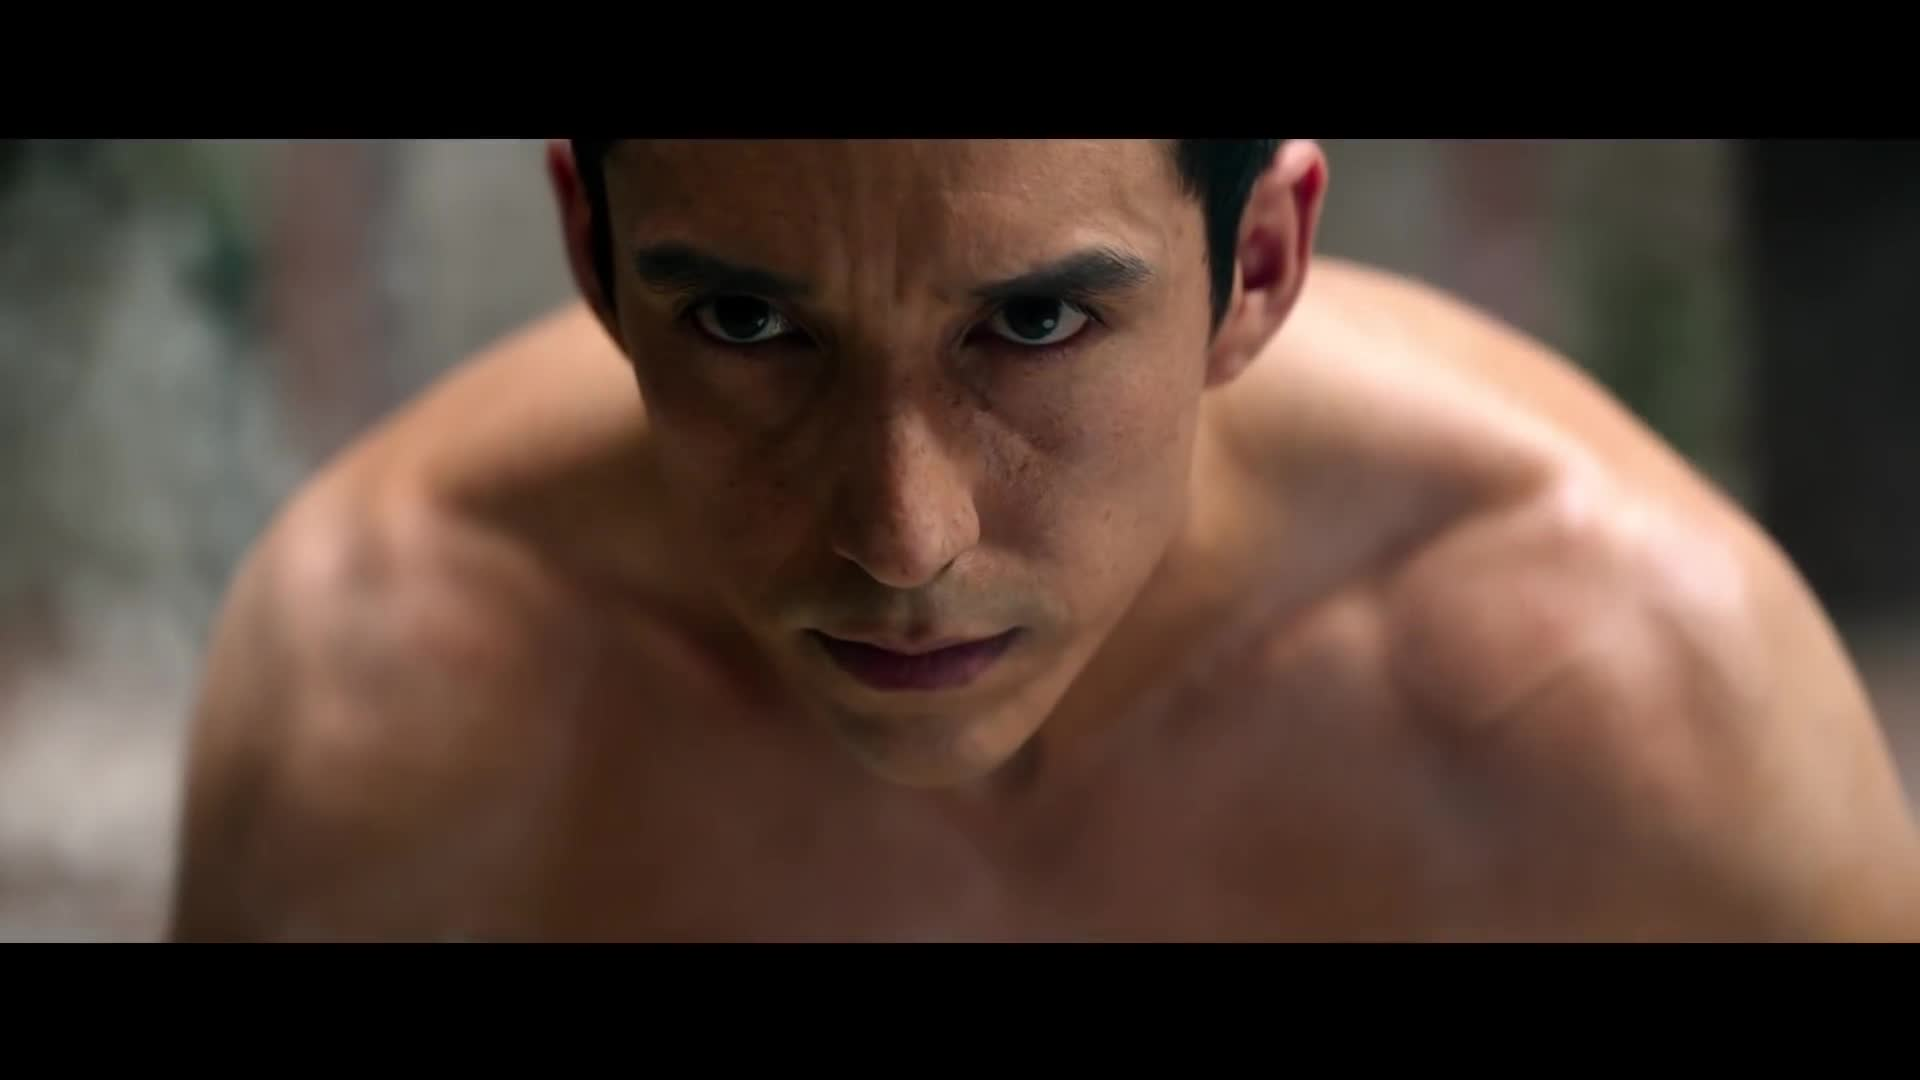 Terminator: Dark Fate - La Mision de Dani Extended Look [HD] screen capture